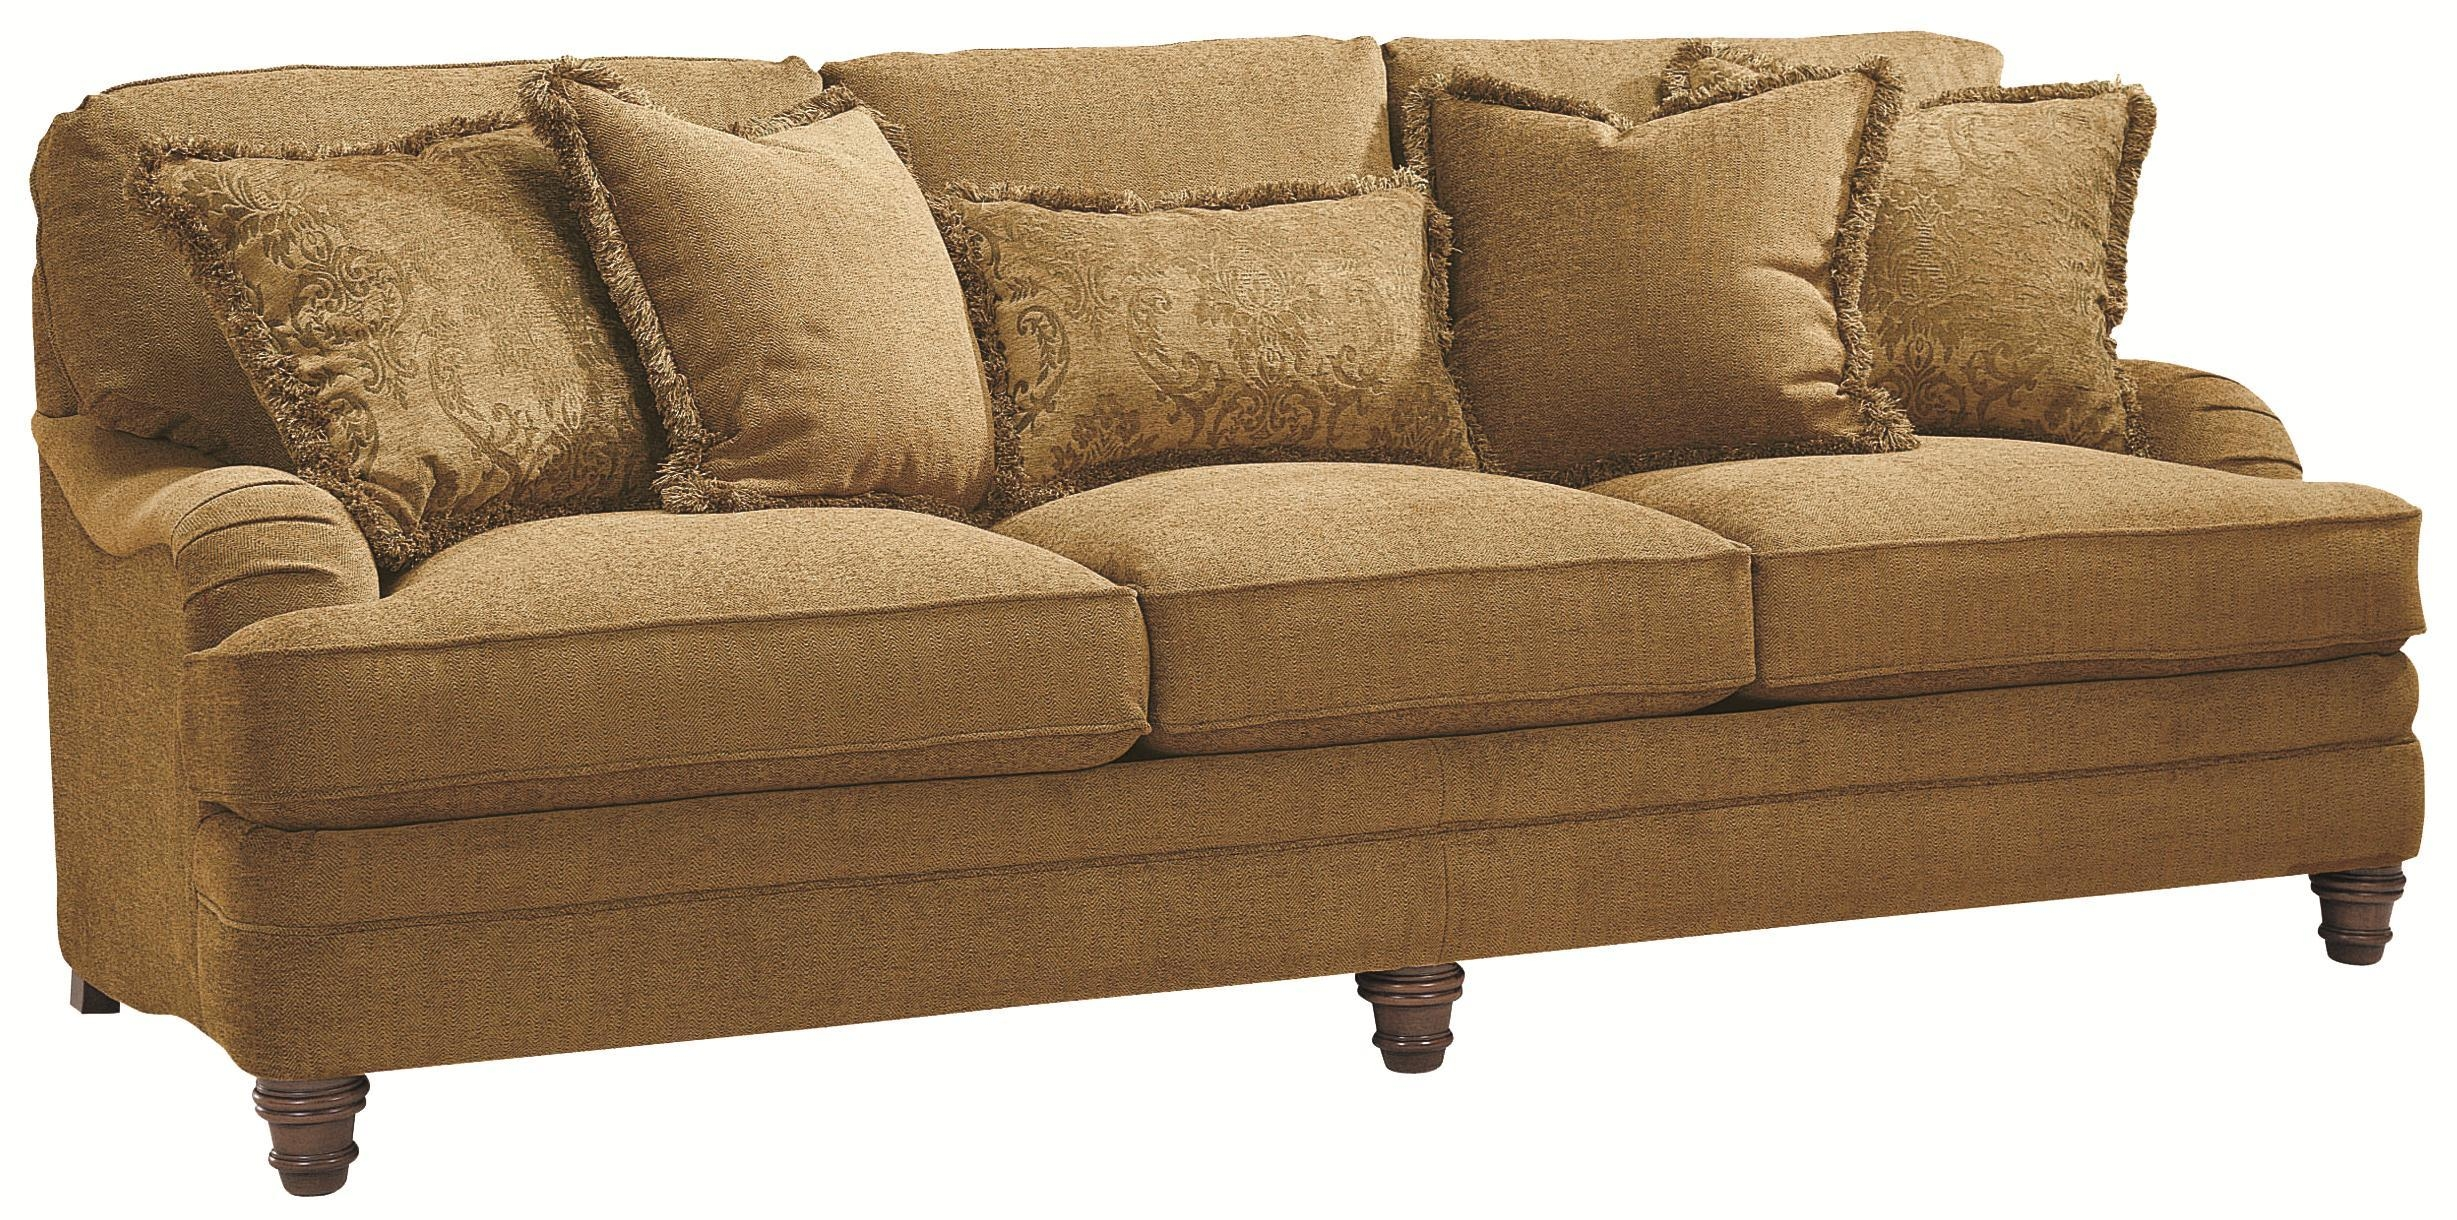 Bernhardt Tarleton Traditional Styled Stationary Sofa In Slightly Intended For Bernhardt Tarleton Sofas (View 2 of 20)